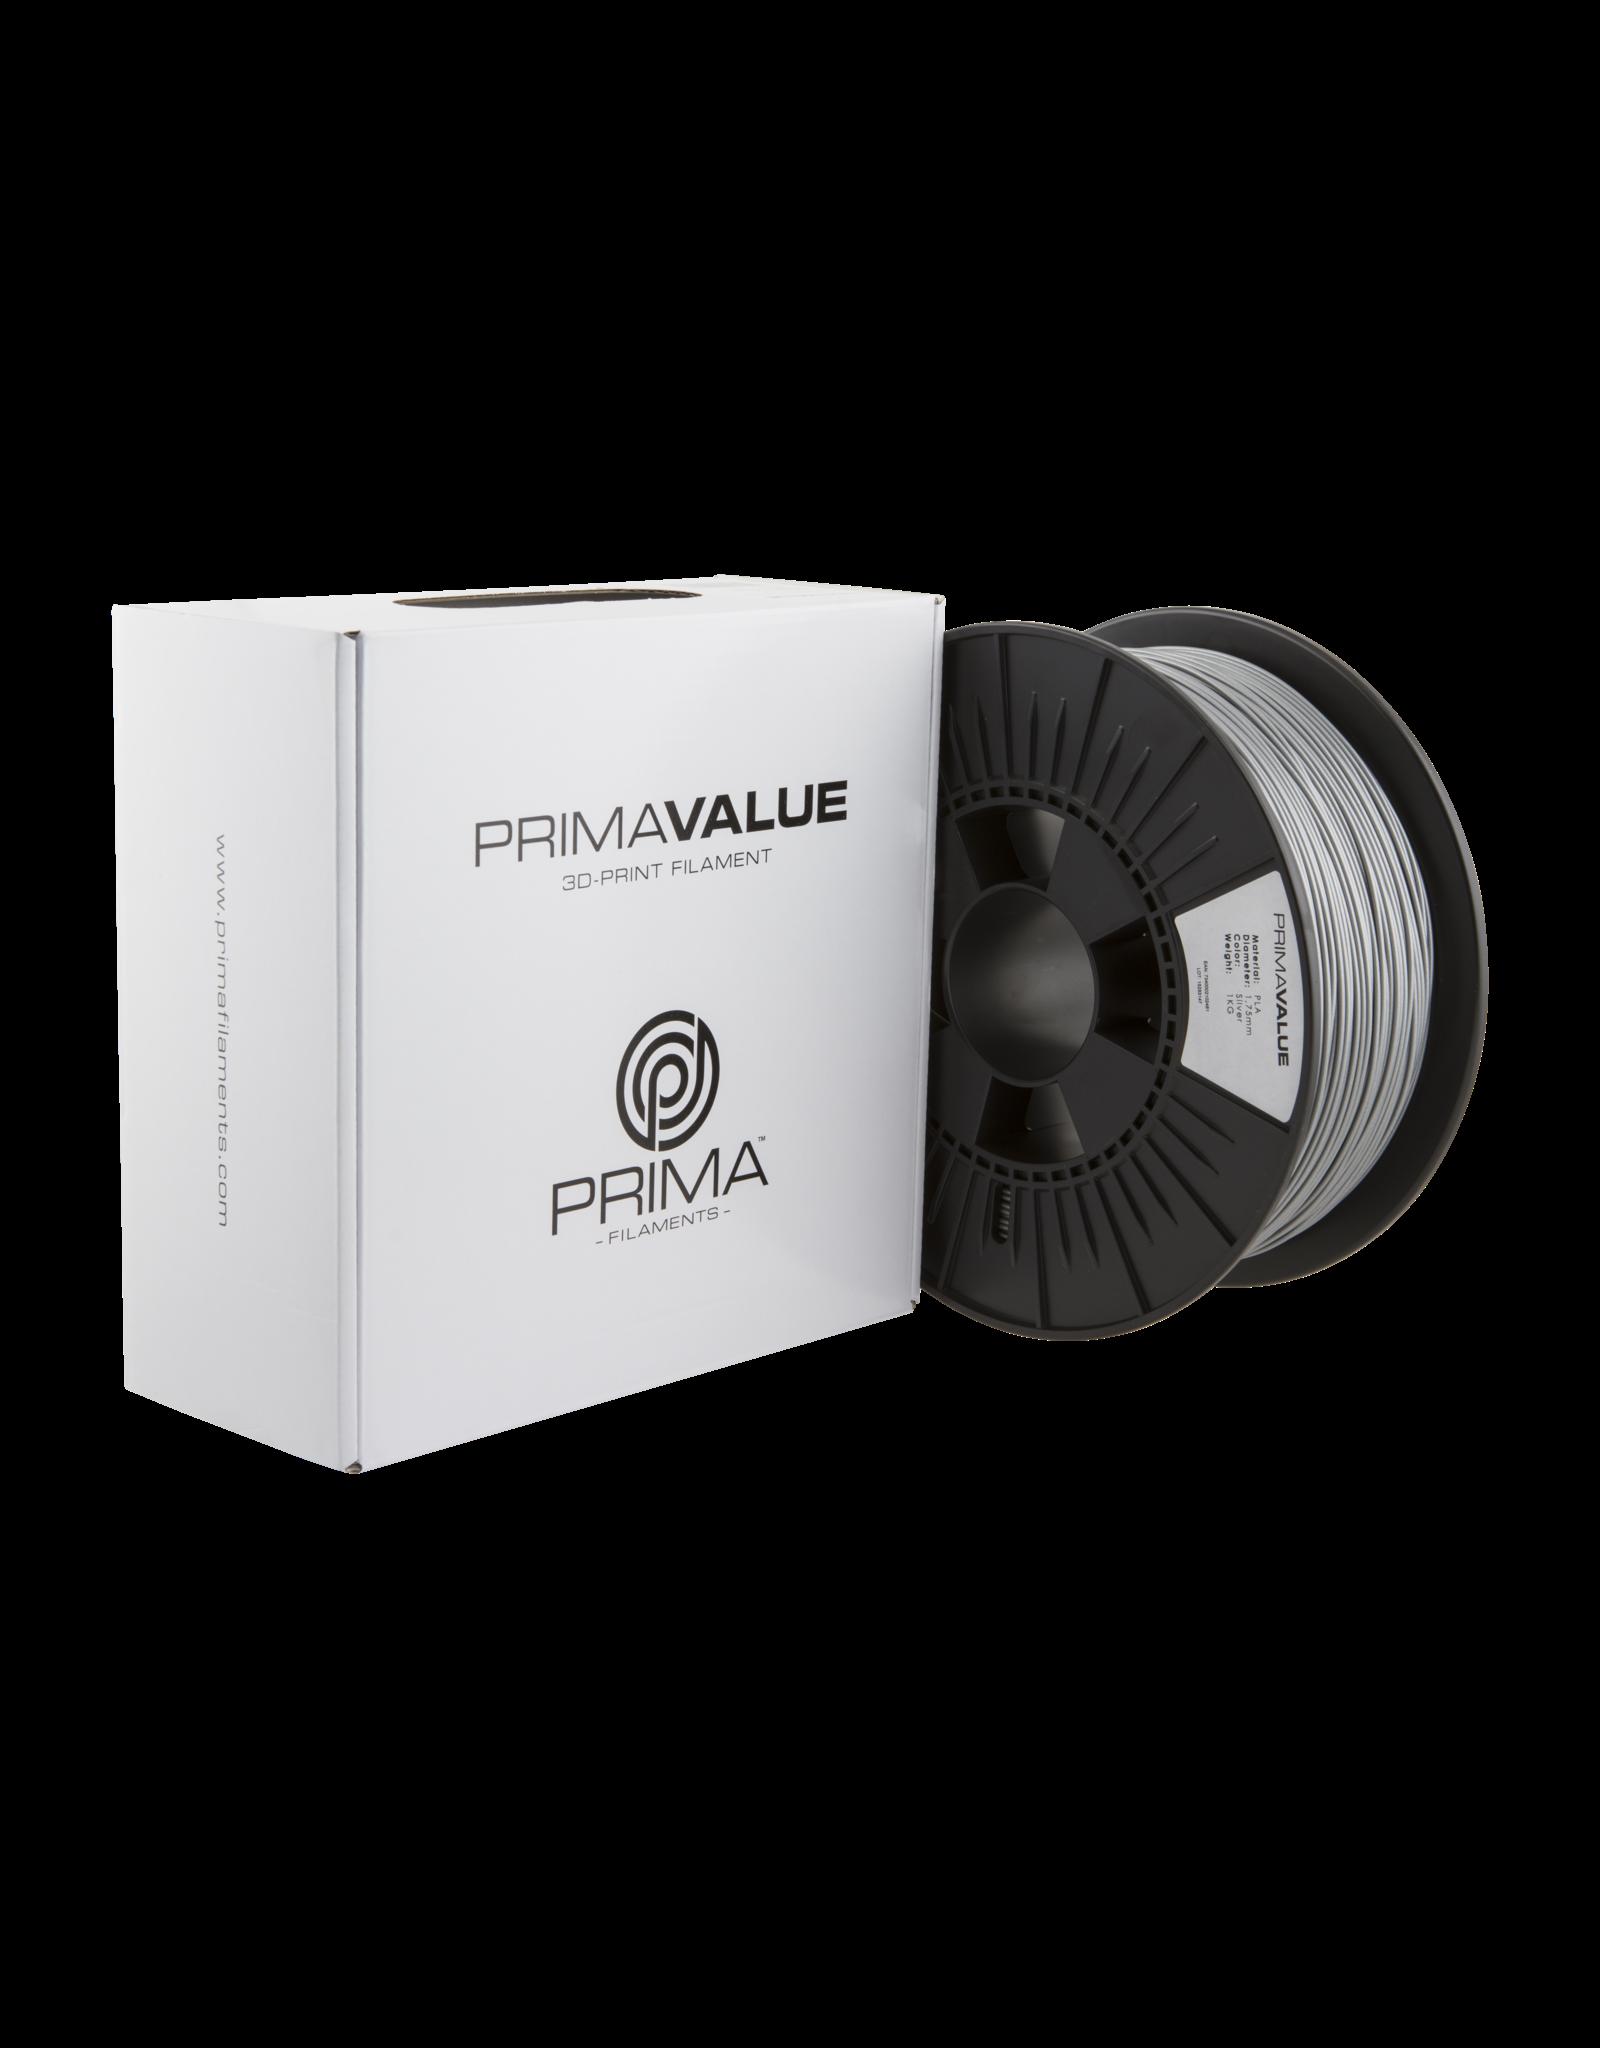 Prima PrimaValue PLA Filament 1.75mm 1 kg zilver